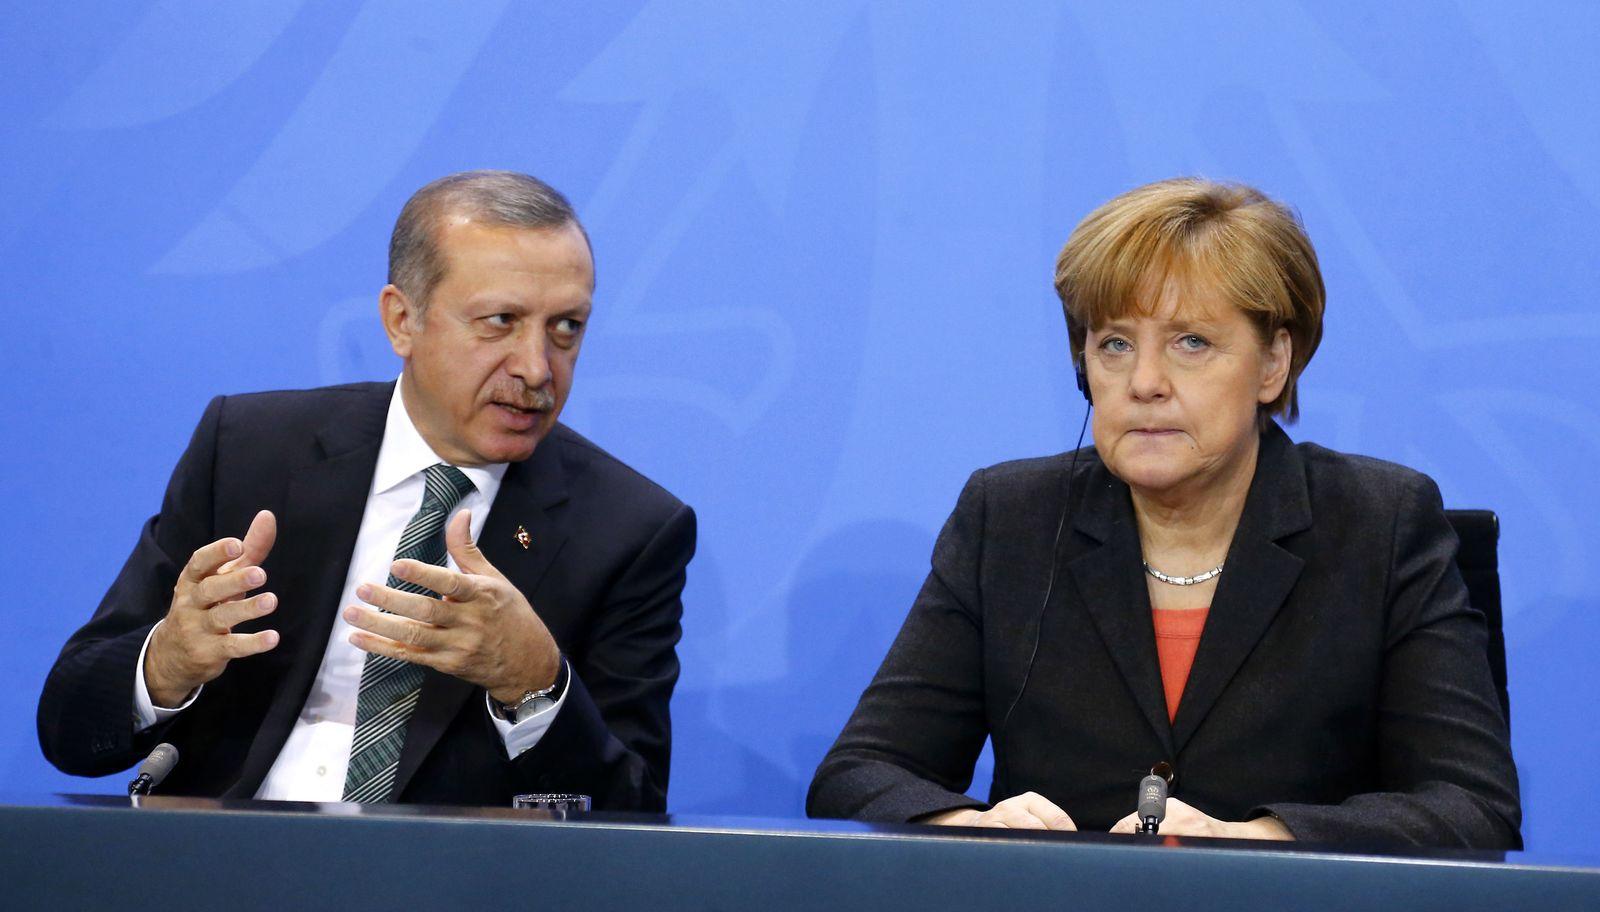 Tayyip Erdogan/ Angela Merkel